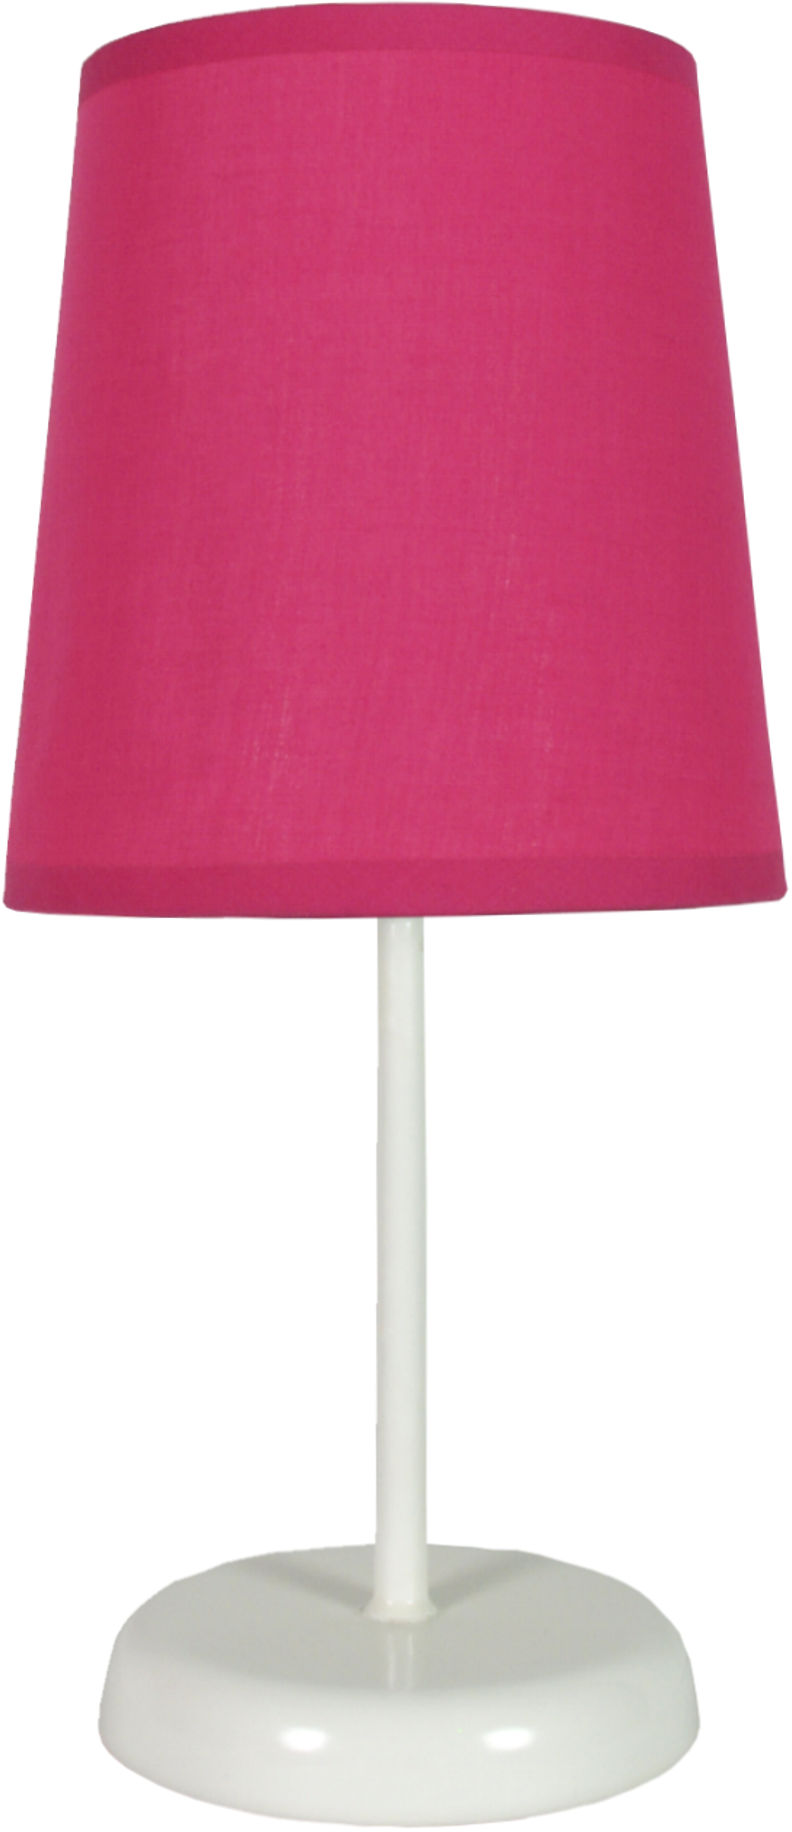 Candellux GALA 41-98415 lampa stołowa abażur fuksja 1X40W E14 14 cm